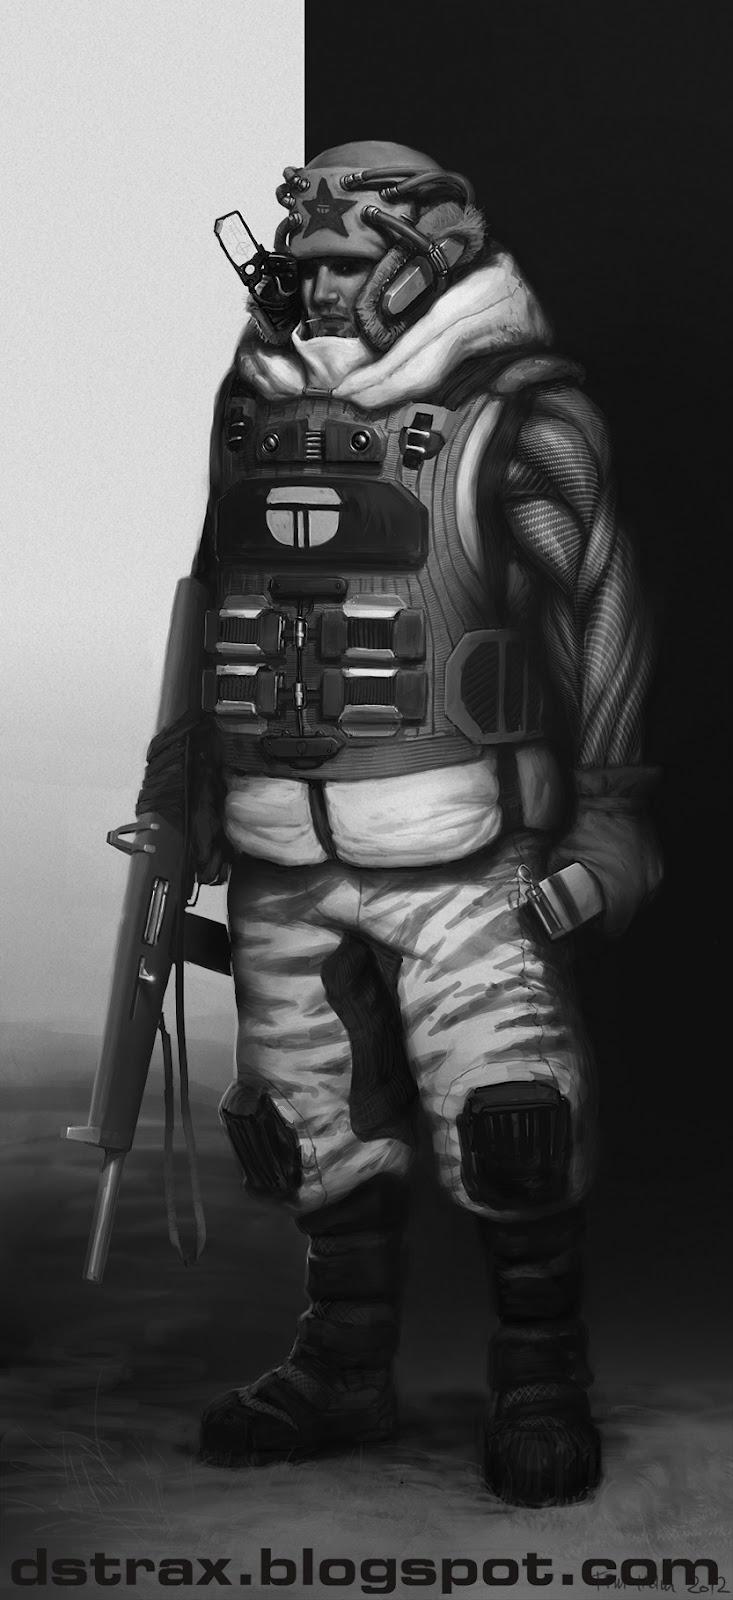 [Image: CCCP+Bionic+Soldier.JPG]